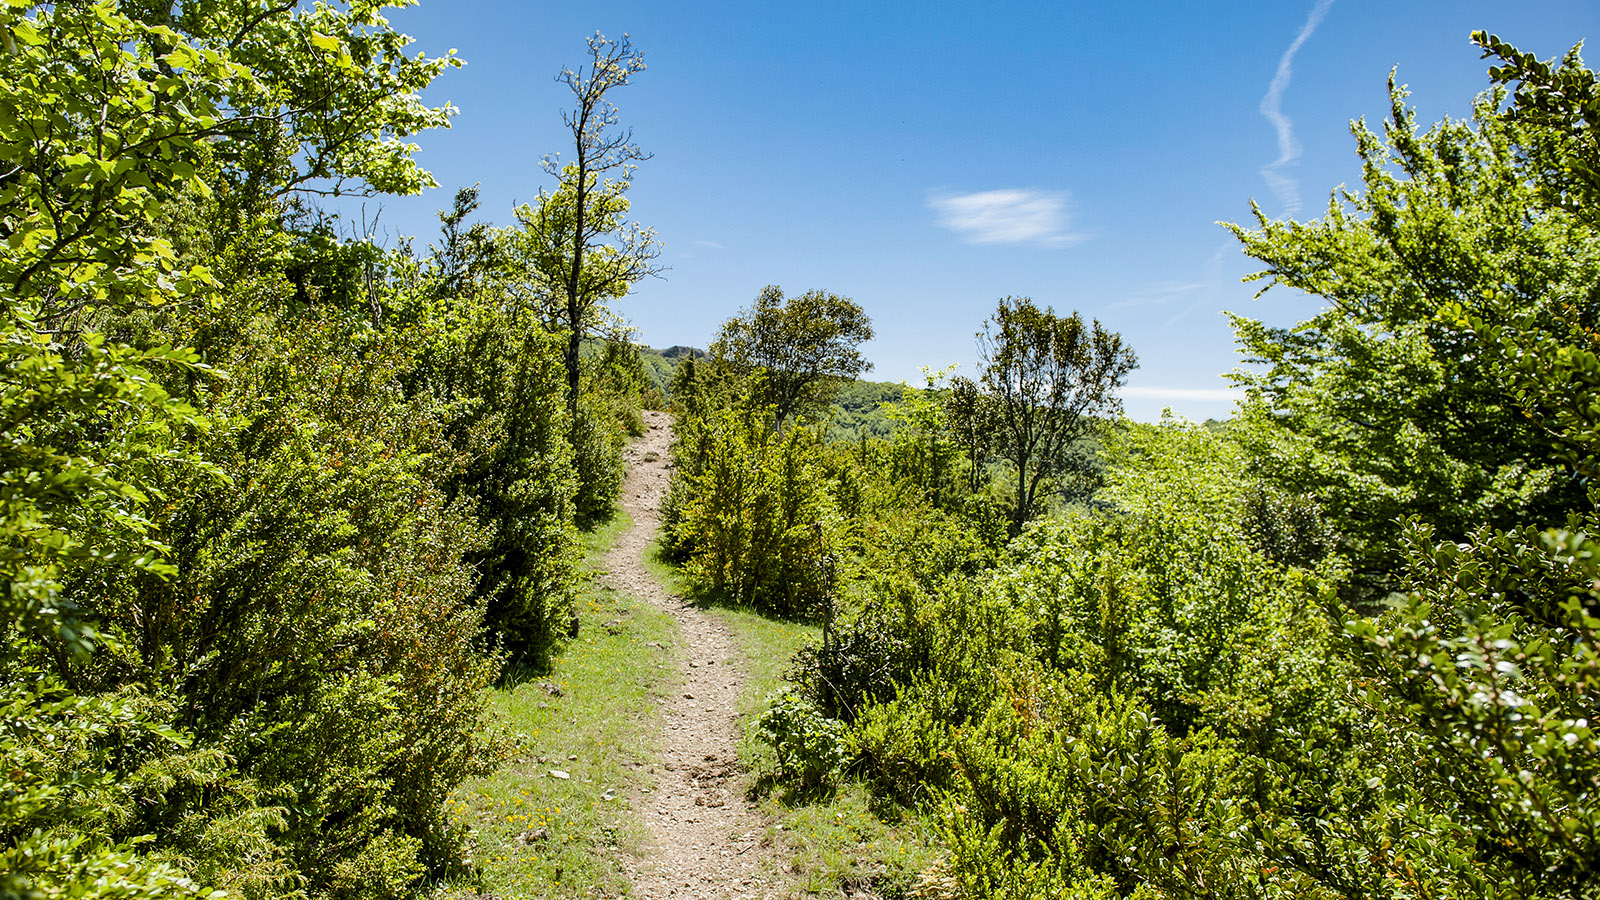 Pech de Bugarach sieht flach aus, steigt aber merklich an –unser Wanderweg. Foto: Hilke Maunder